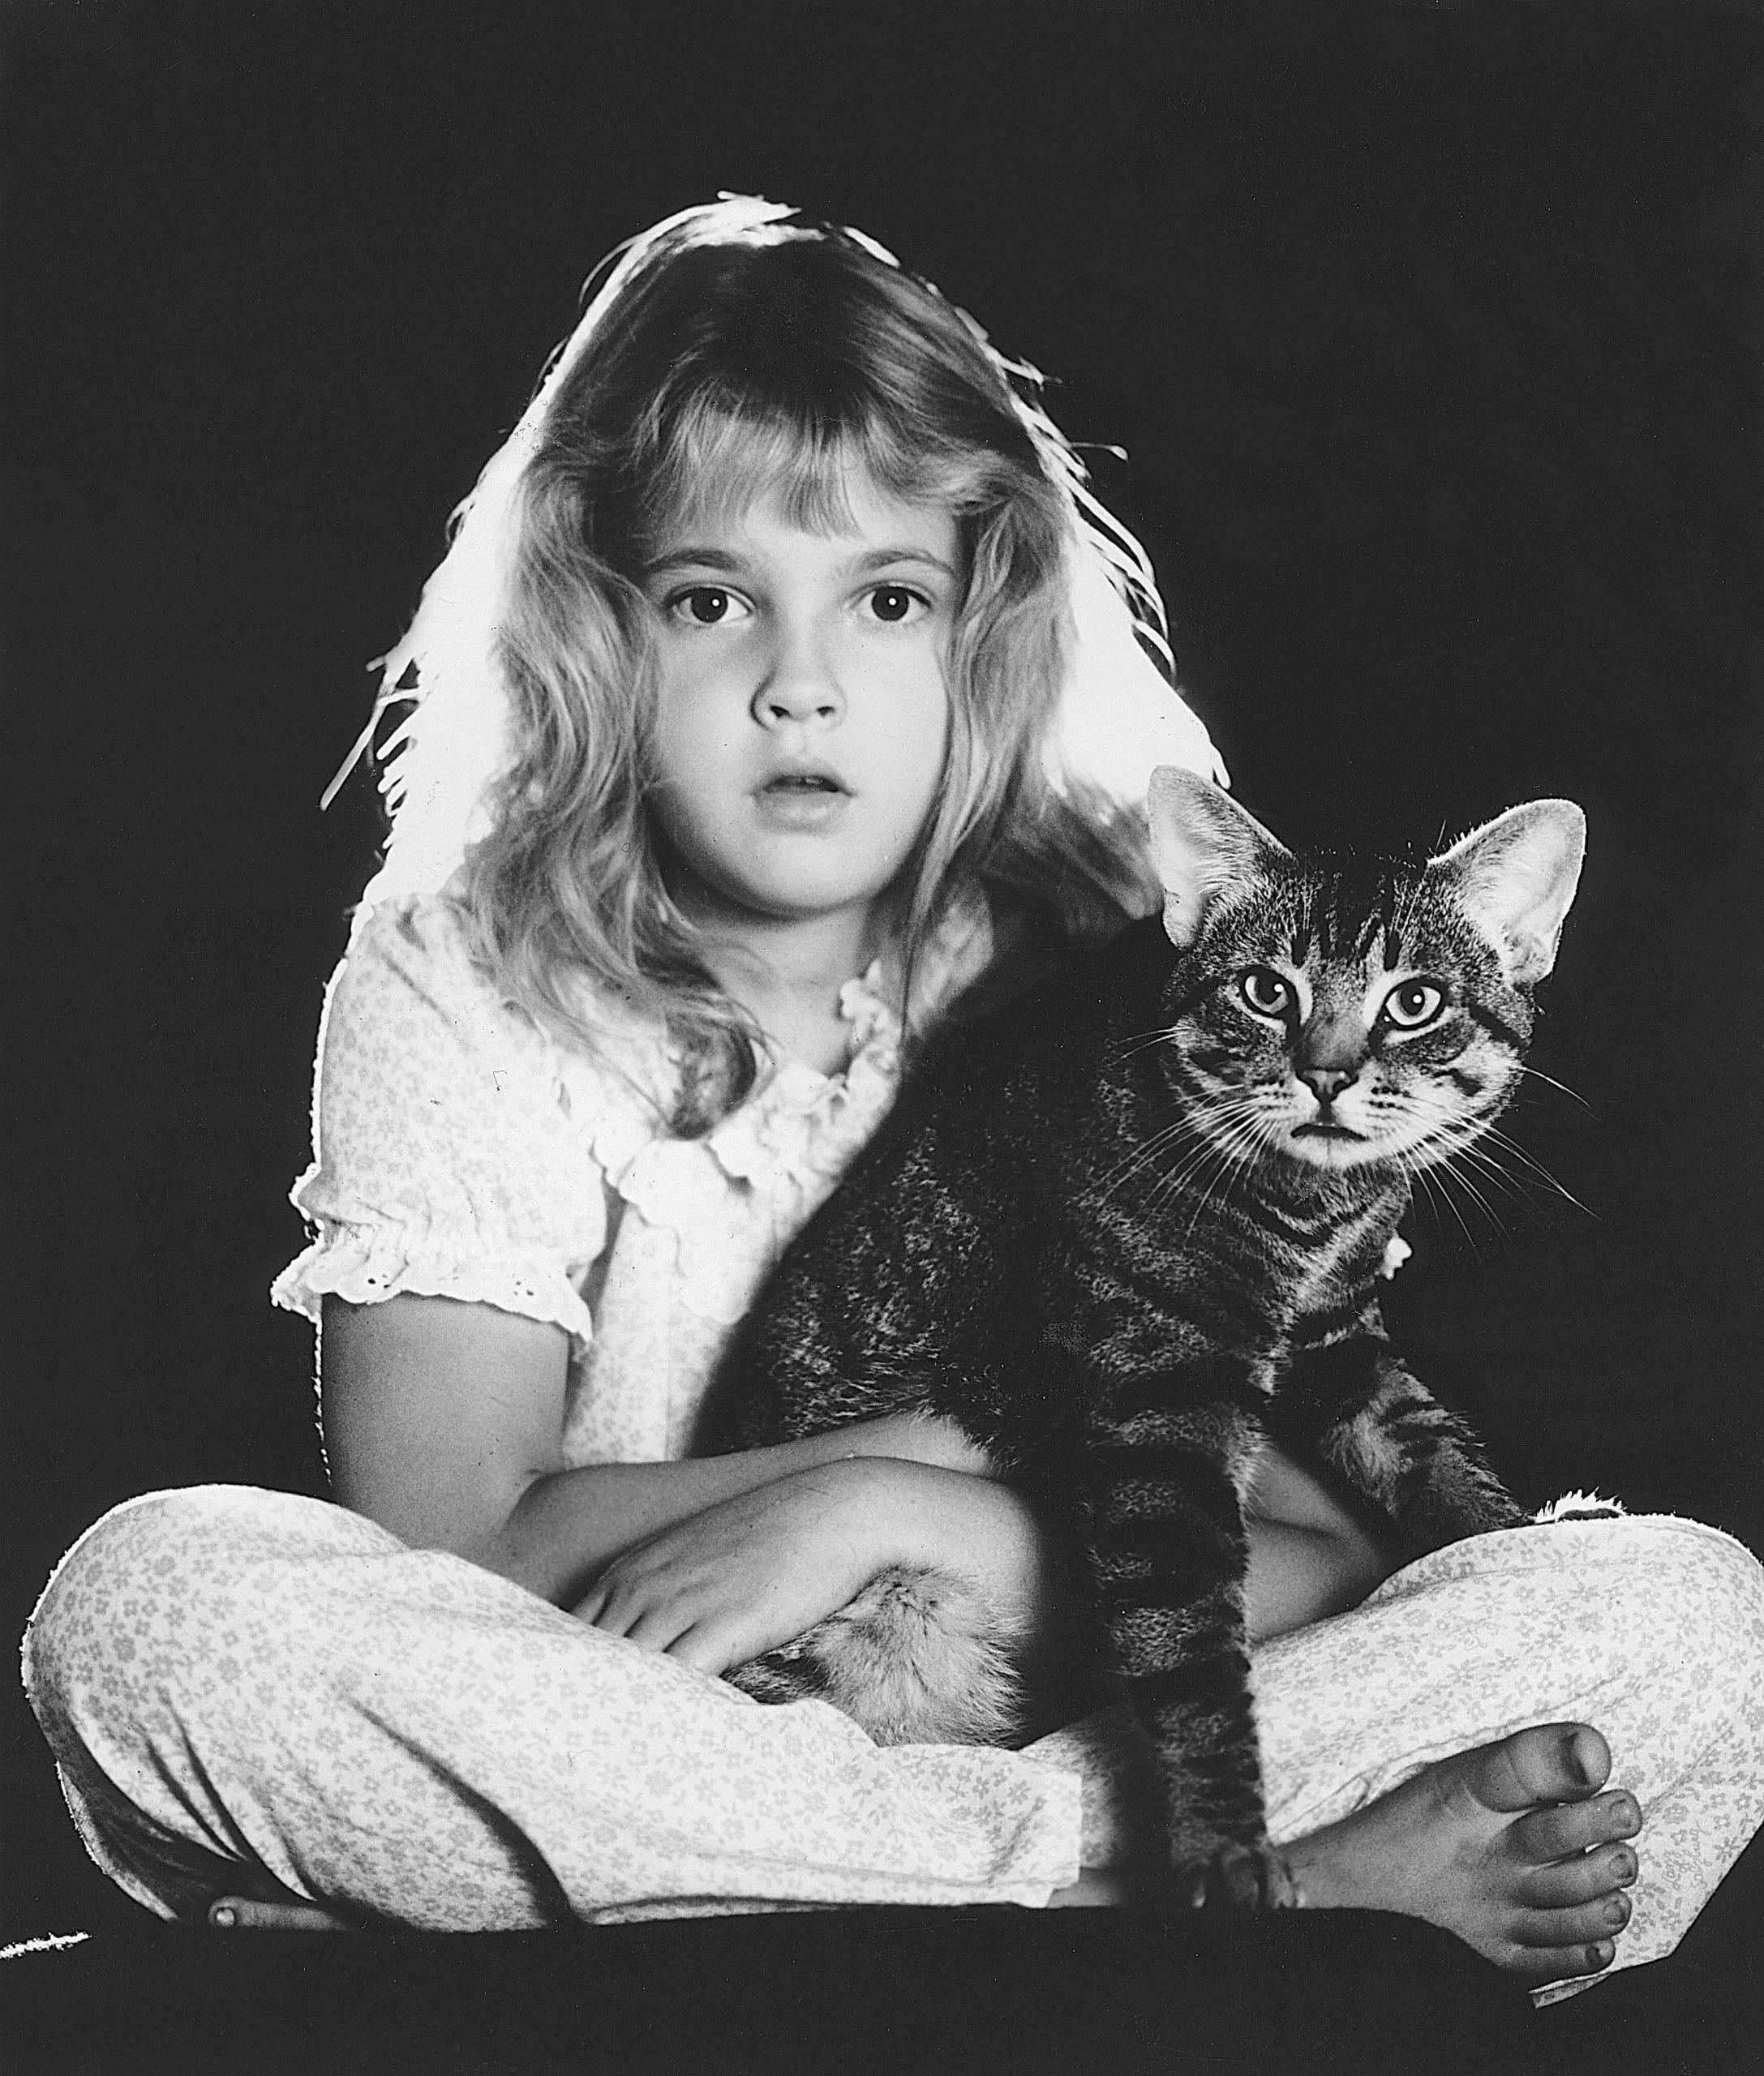 Drew Barrymore photo d